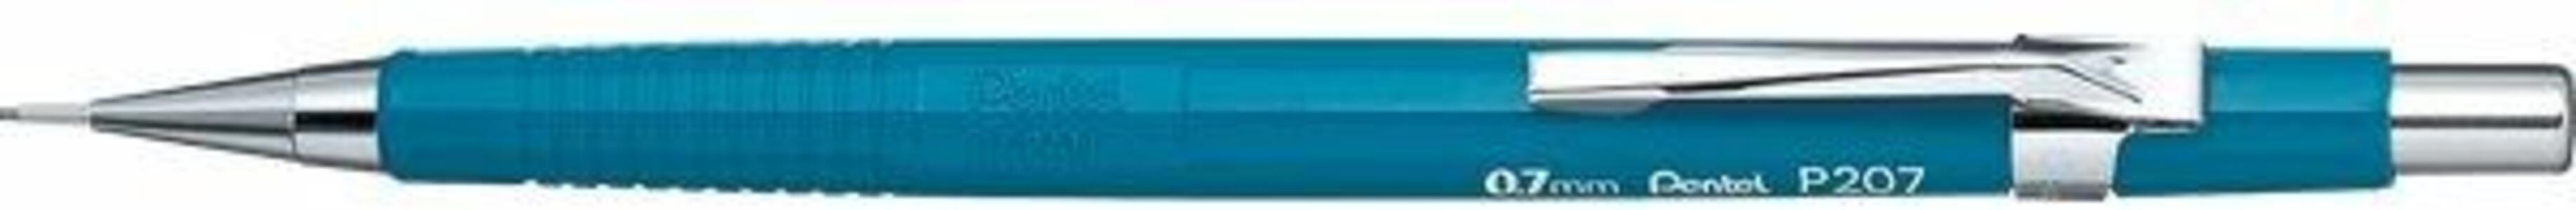 Matita portamine Pentel Sharp blu 0,5 mm